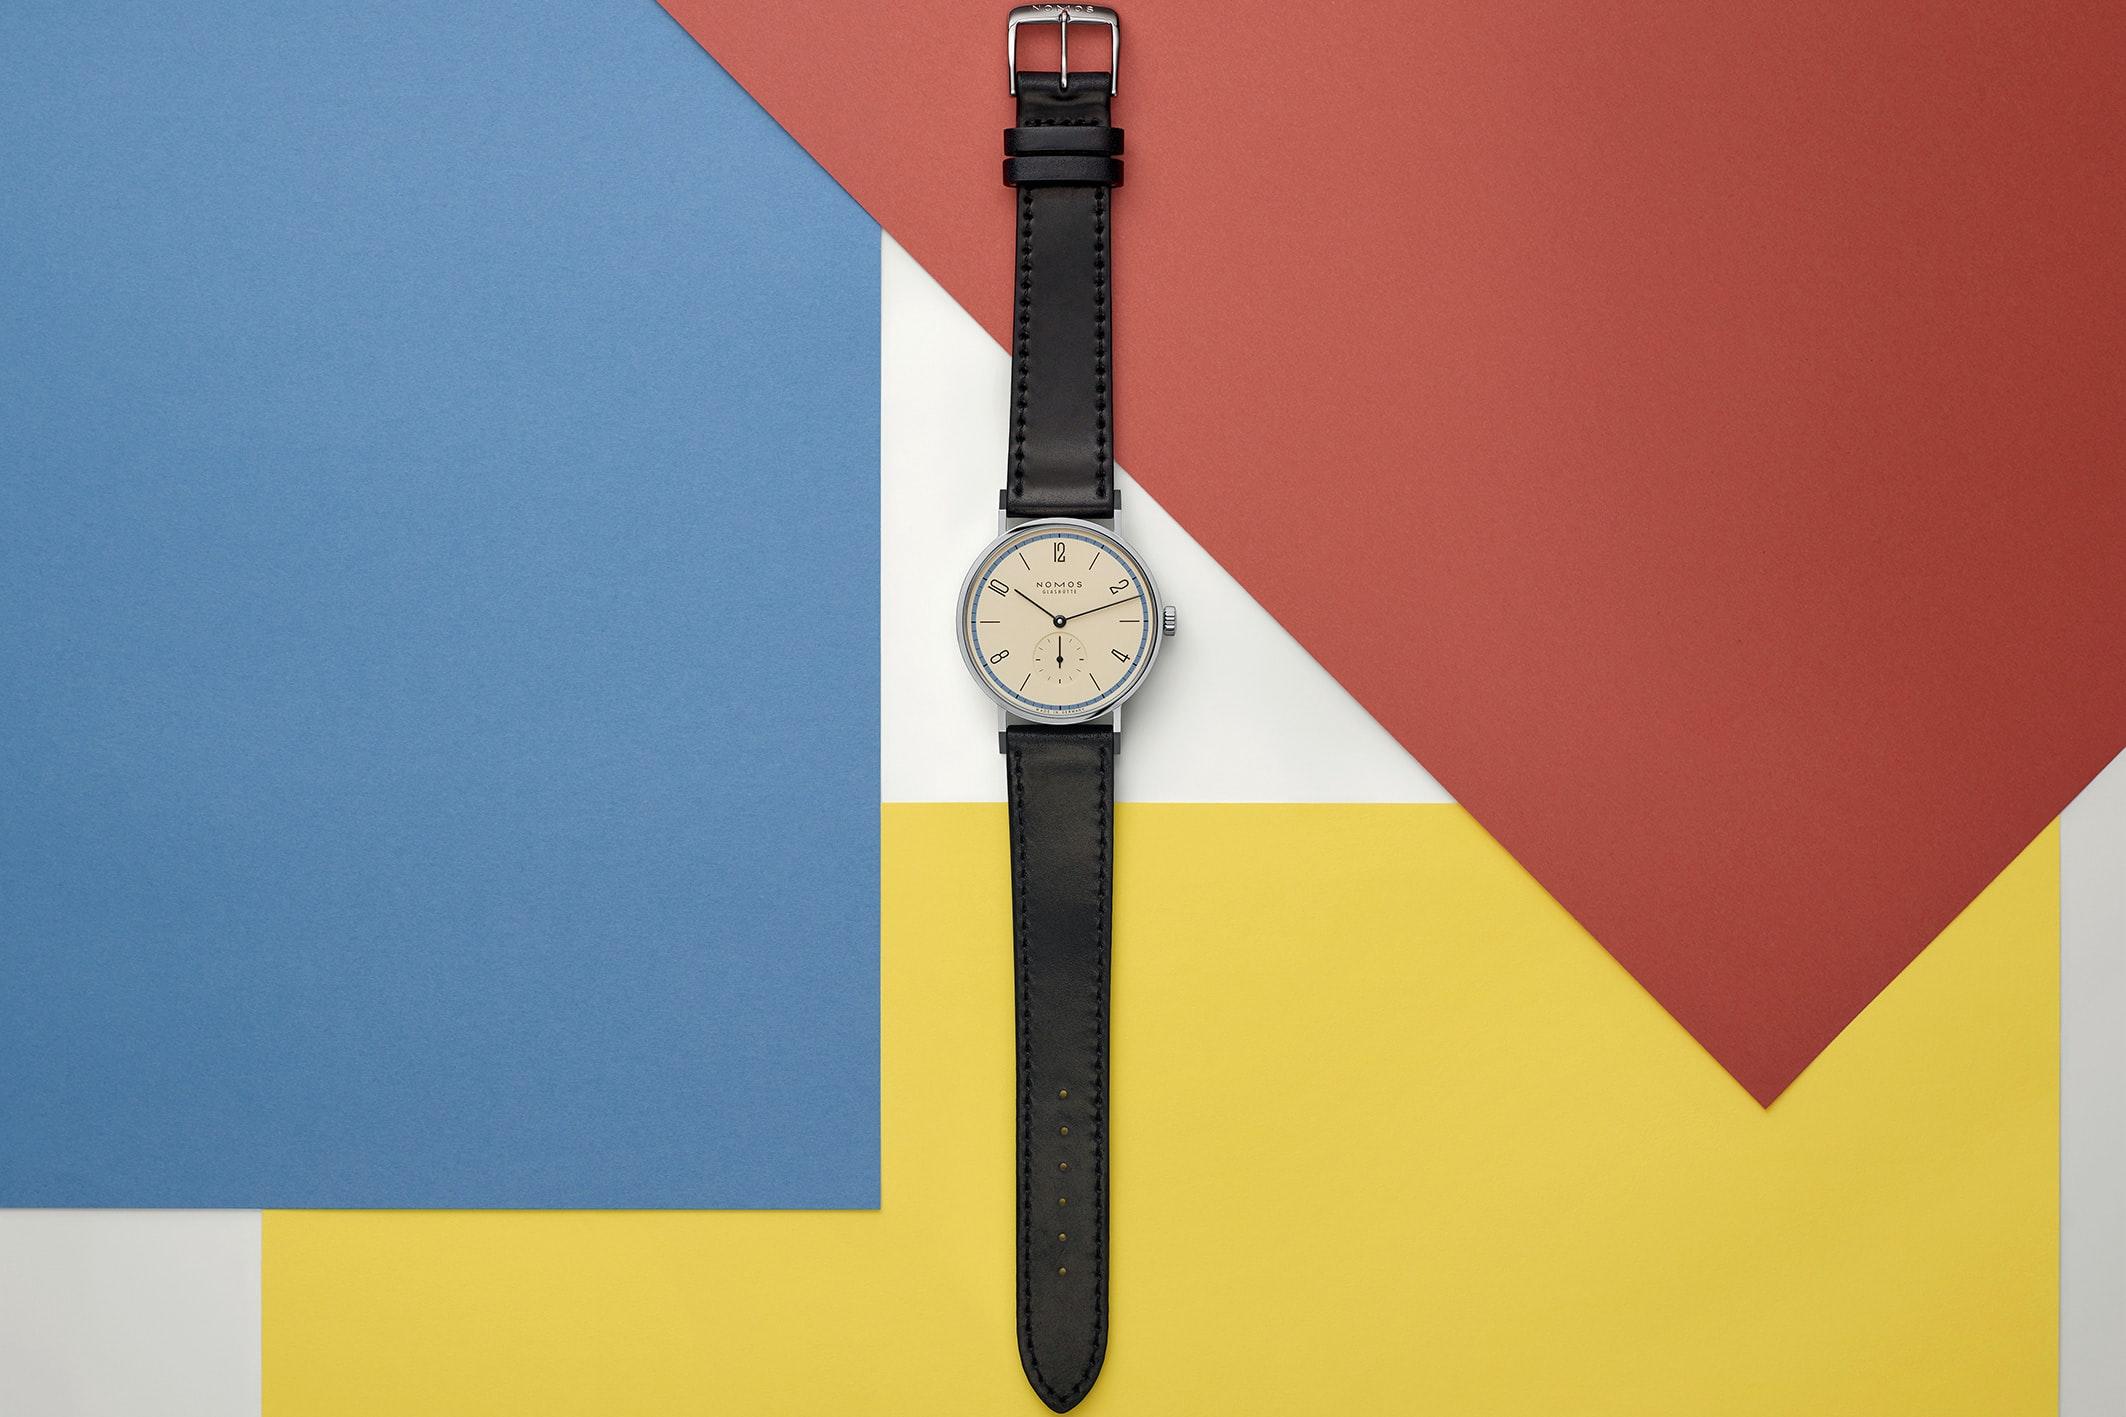 Introducing: The NOMOS Glashütte Tangente 'A Century Of Bauhaus' Limited Editions (Exclusive) nomos 03